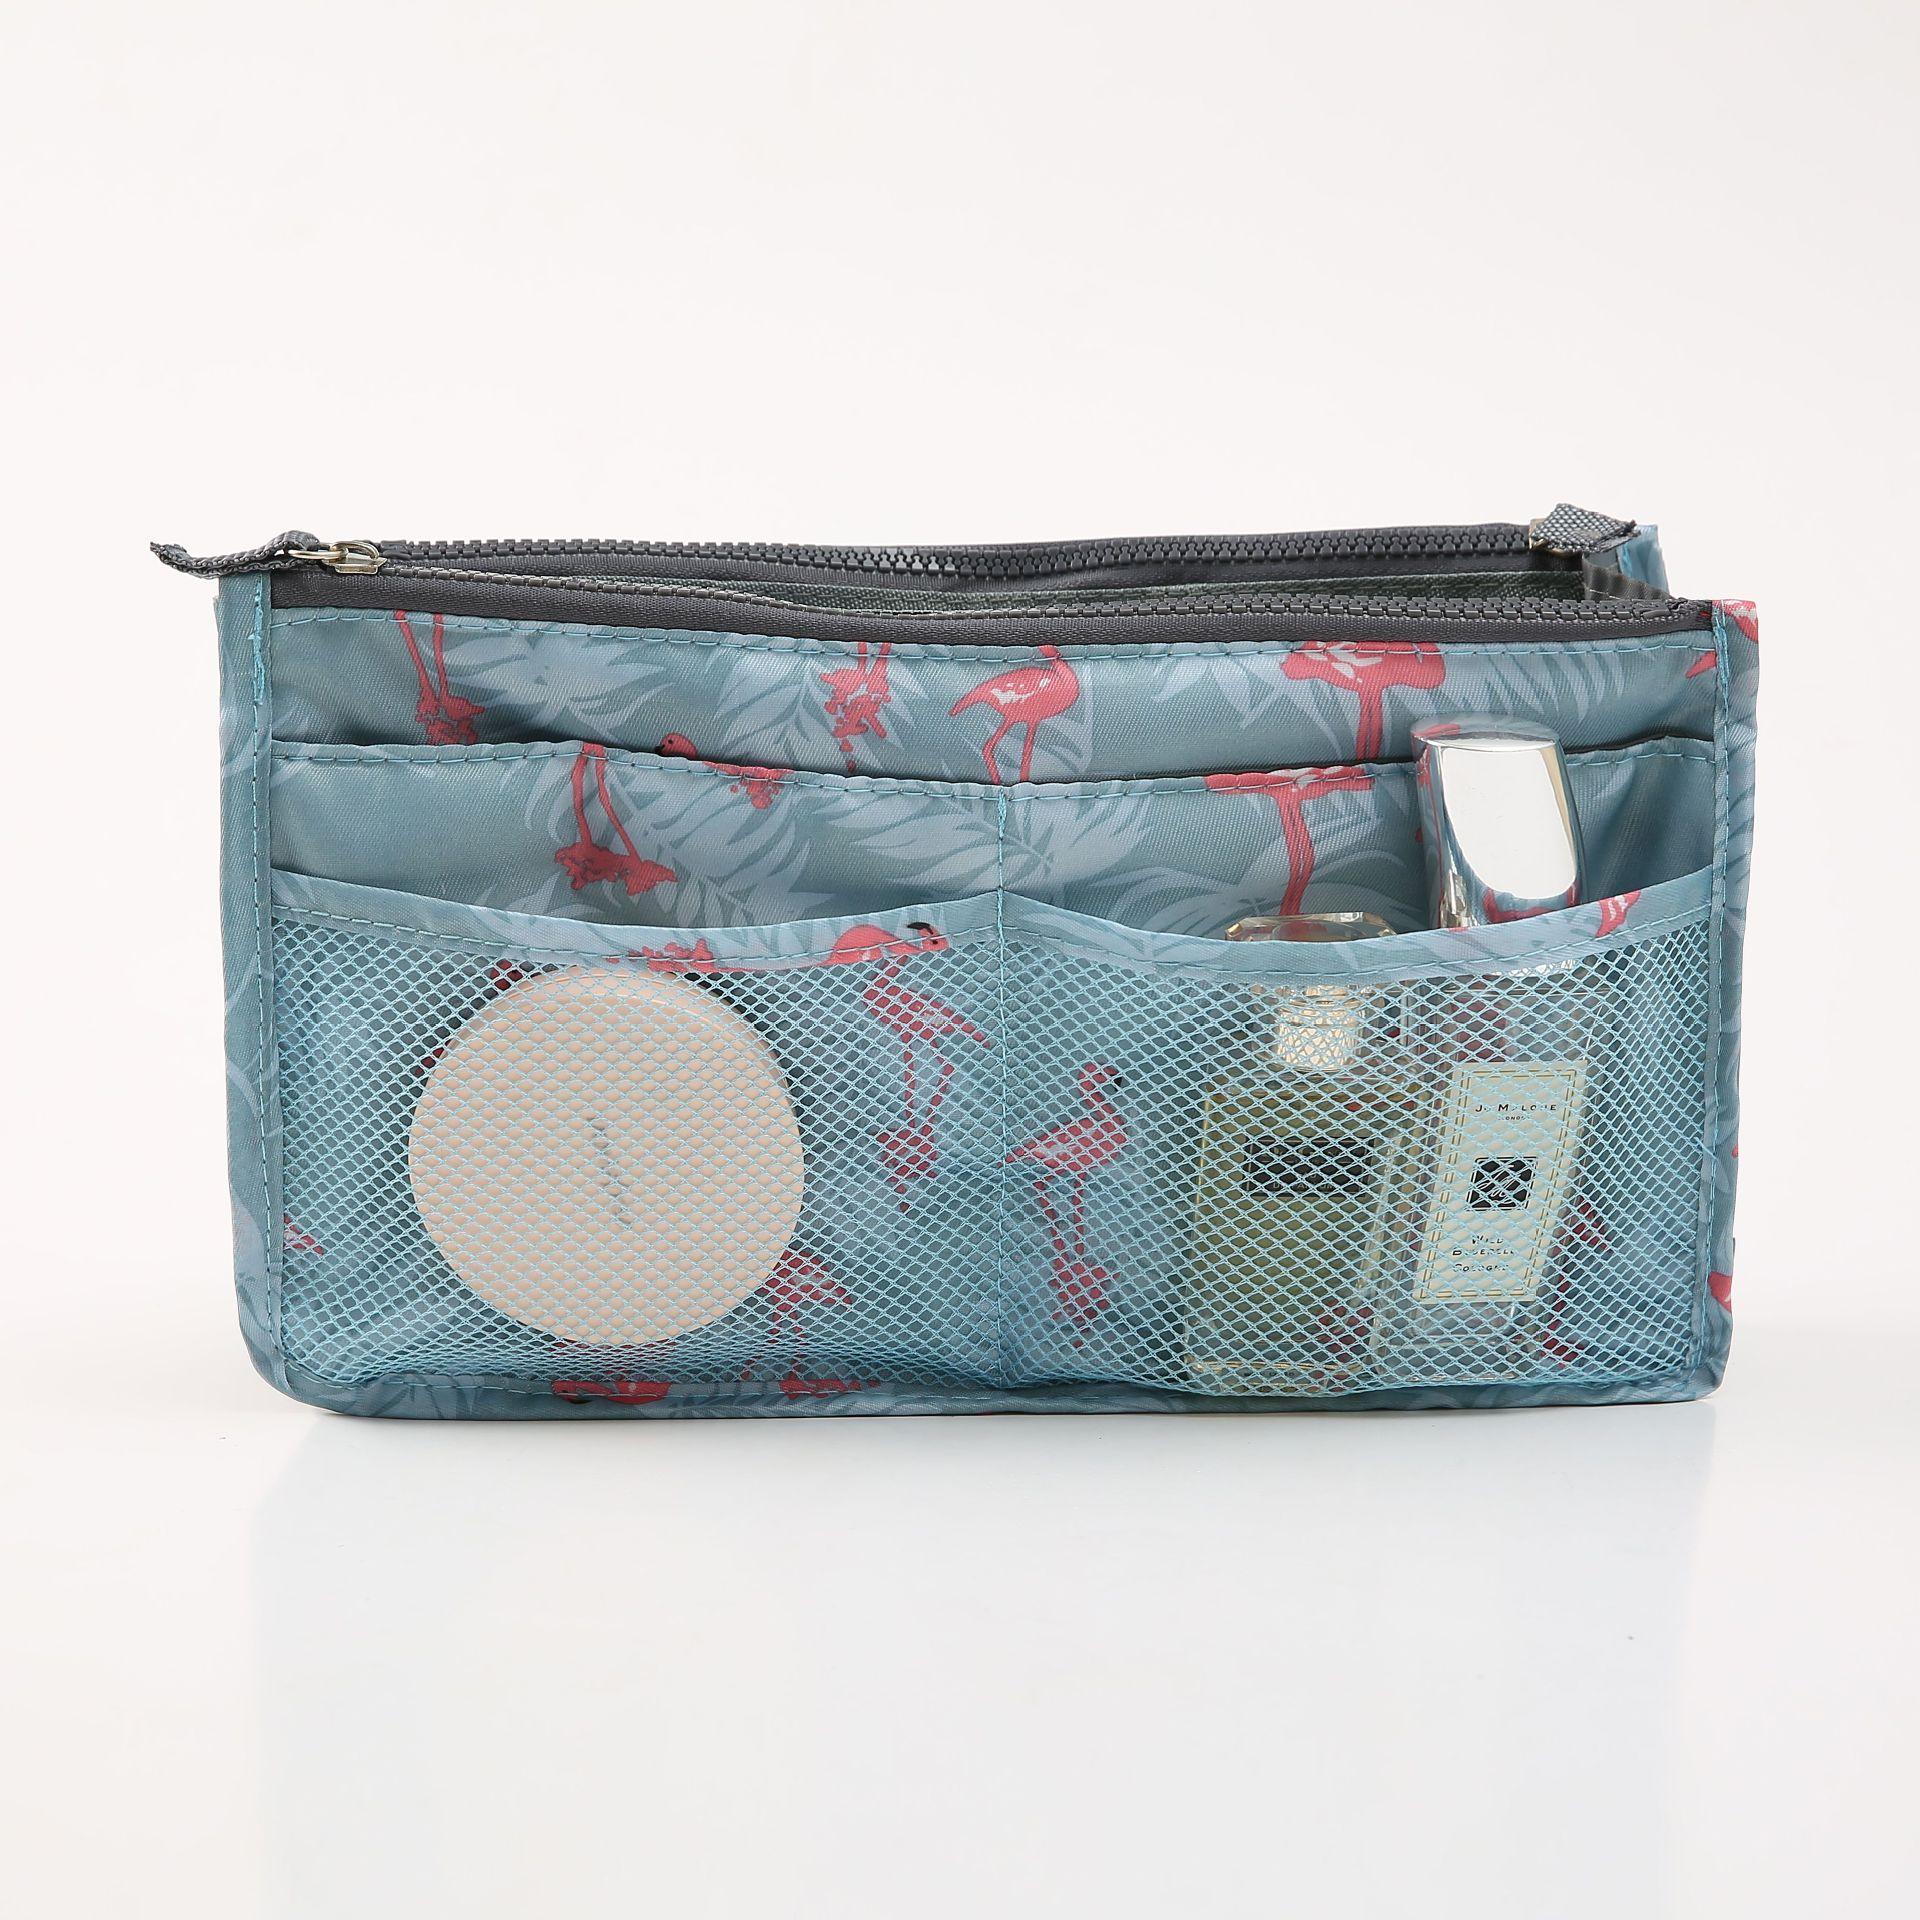 FUDEAM Polyester Flamingo Portable Cosmetic Bag Women Multifunction Travel Storage Organize Handbag Make up Cosmetic Cases